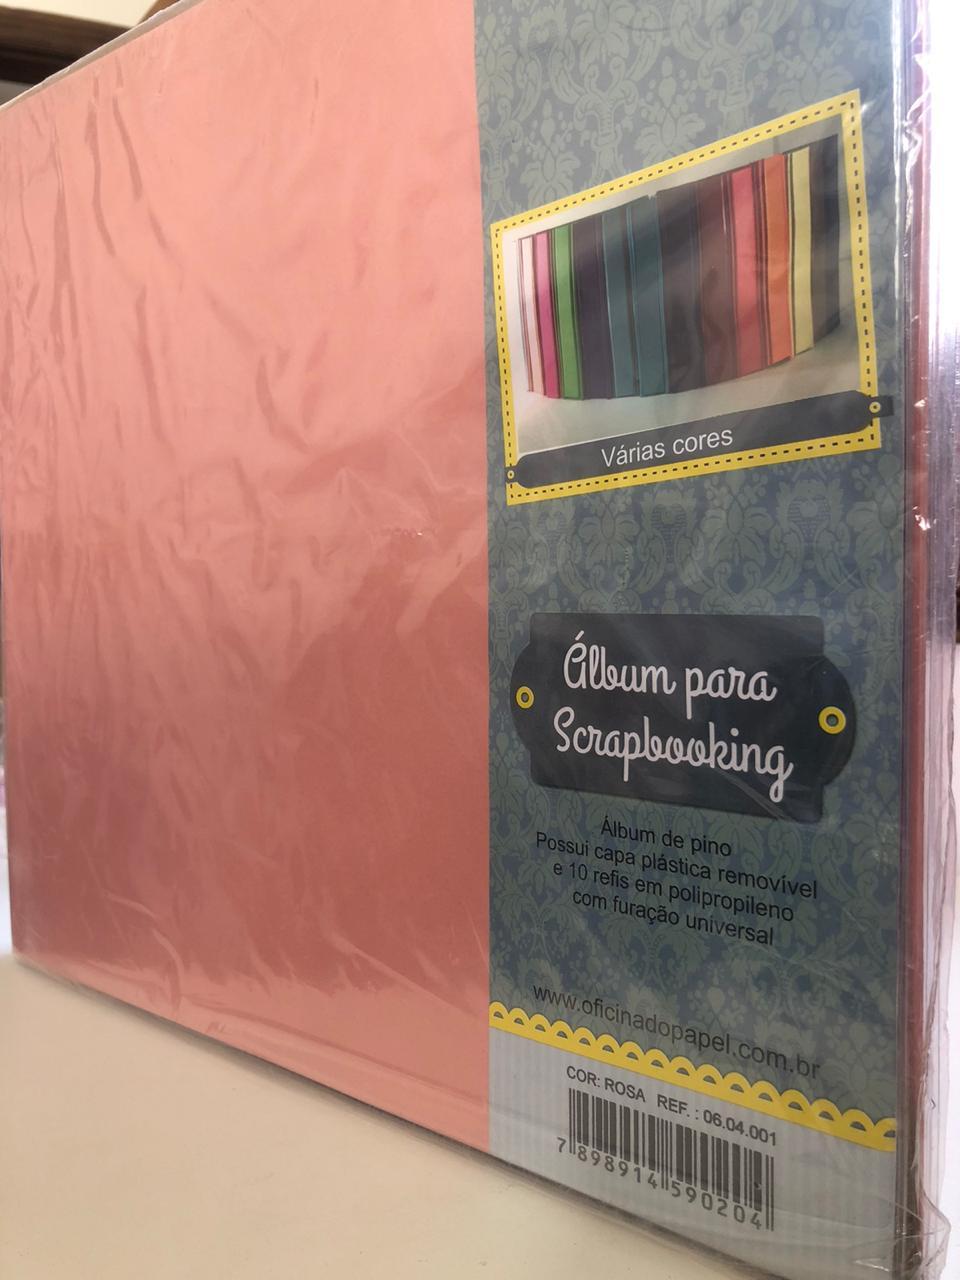 Álbum para Scrapbooking G - Rosa - Oficina do Papel (0604001)